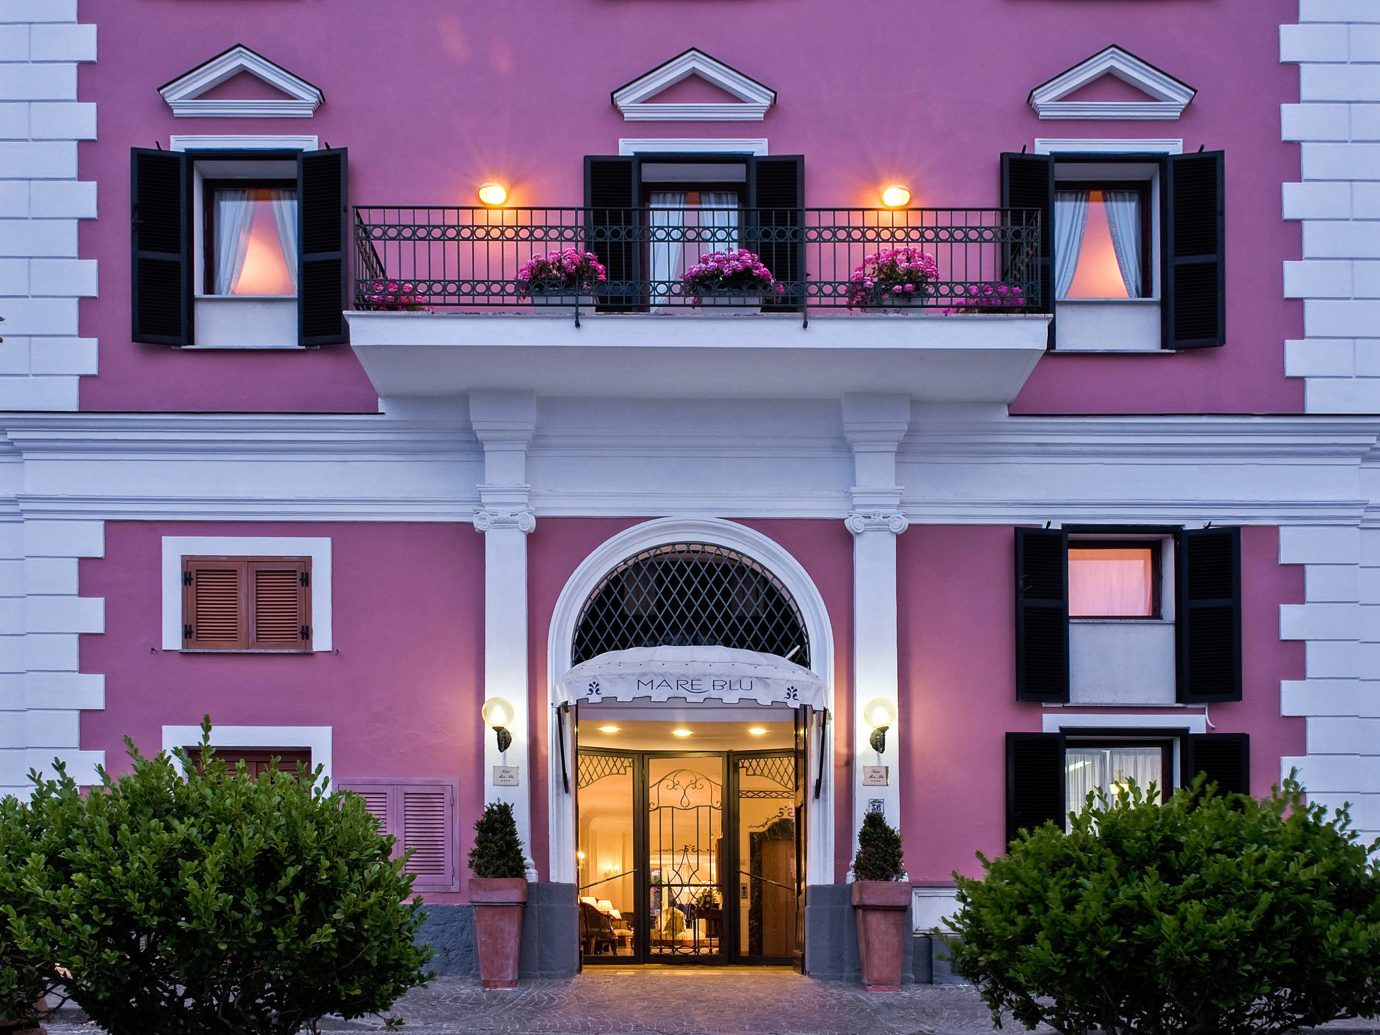 Exterior Hip Travel Trends Trip Ideas building outdoor house home Architecture facade mansion estate interior design Courtyard purple stone